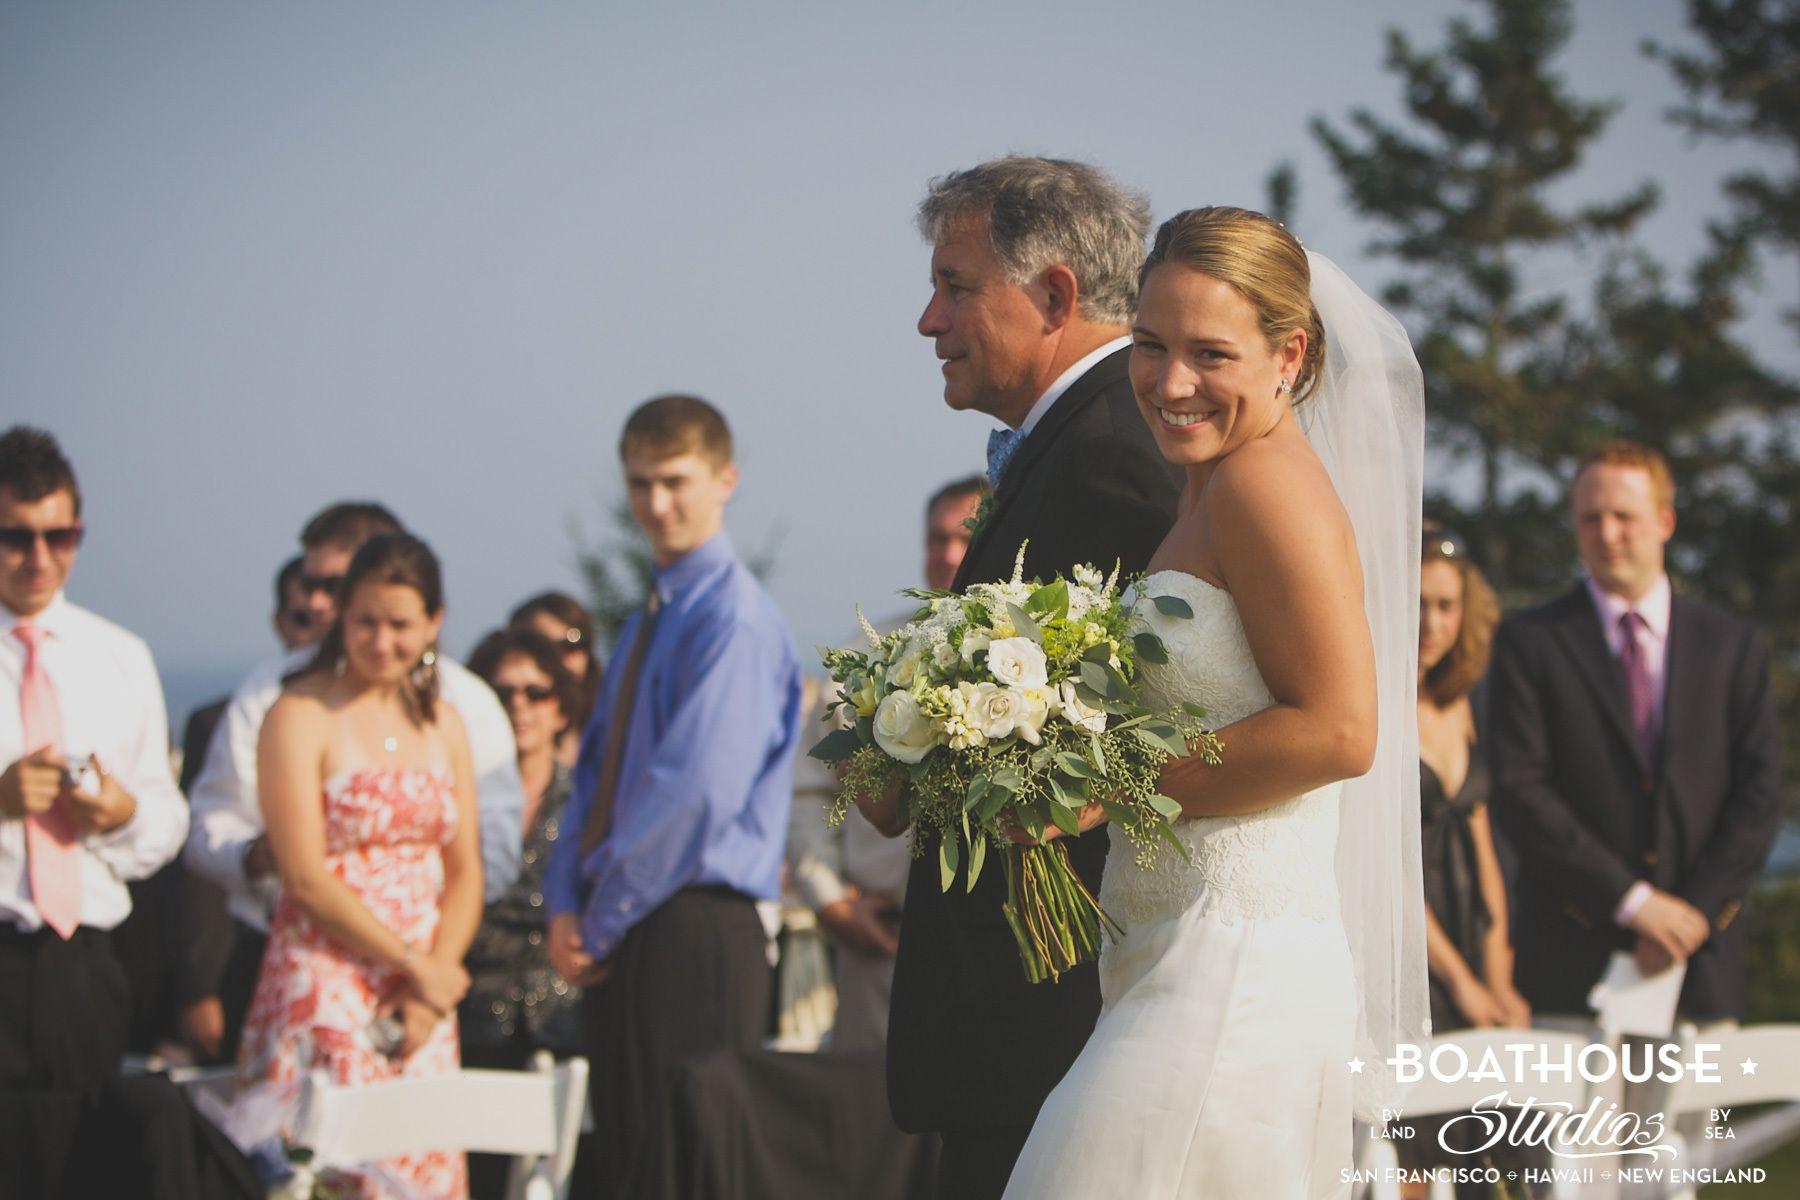 Saltwater Farm Wedding, St. George, Maine.